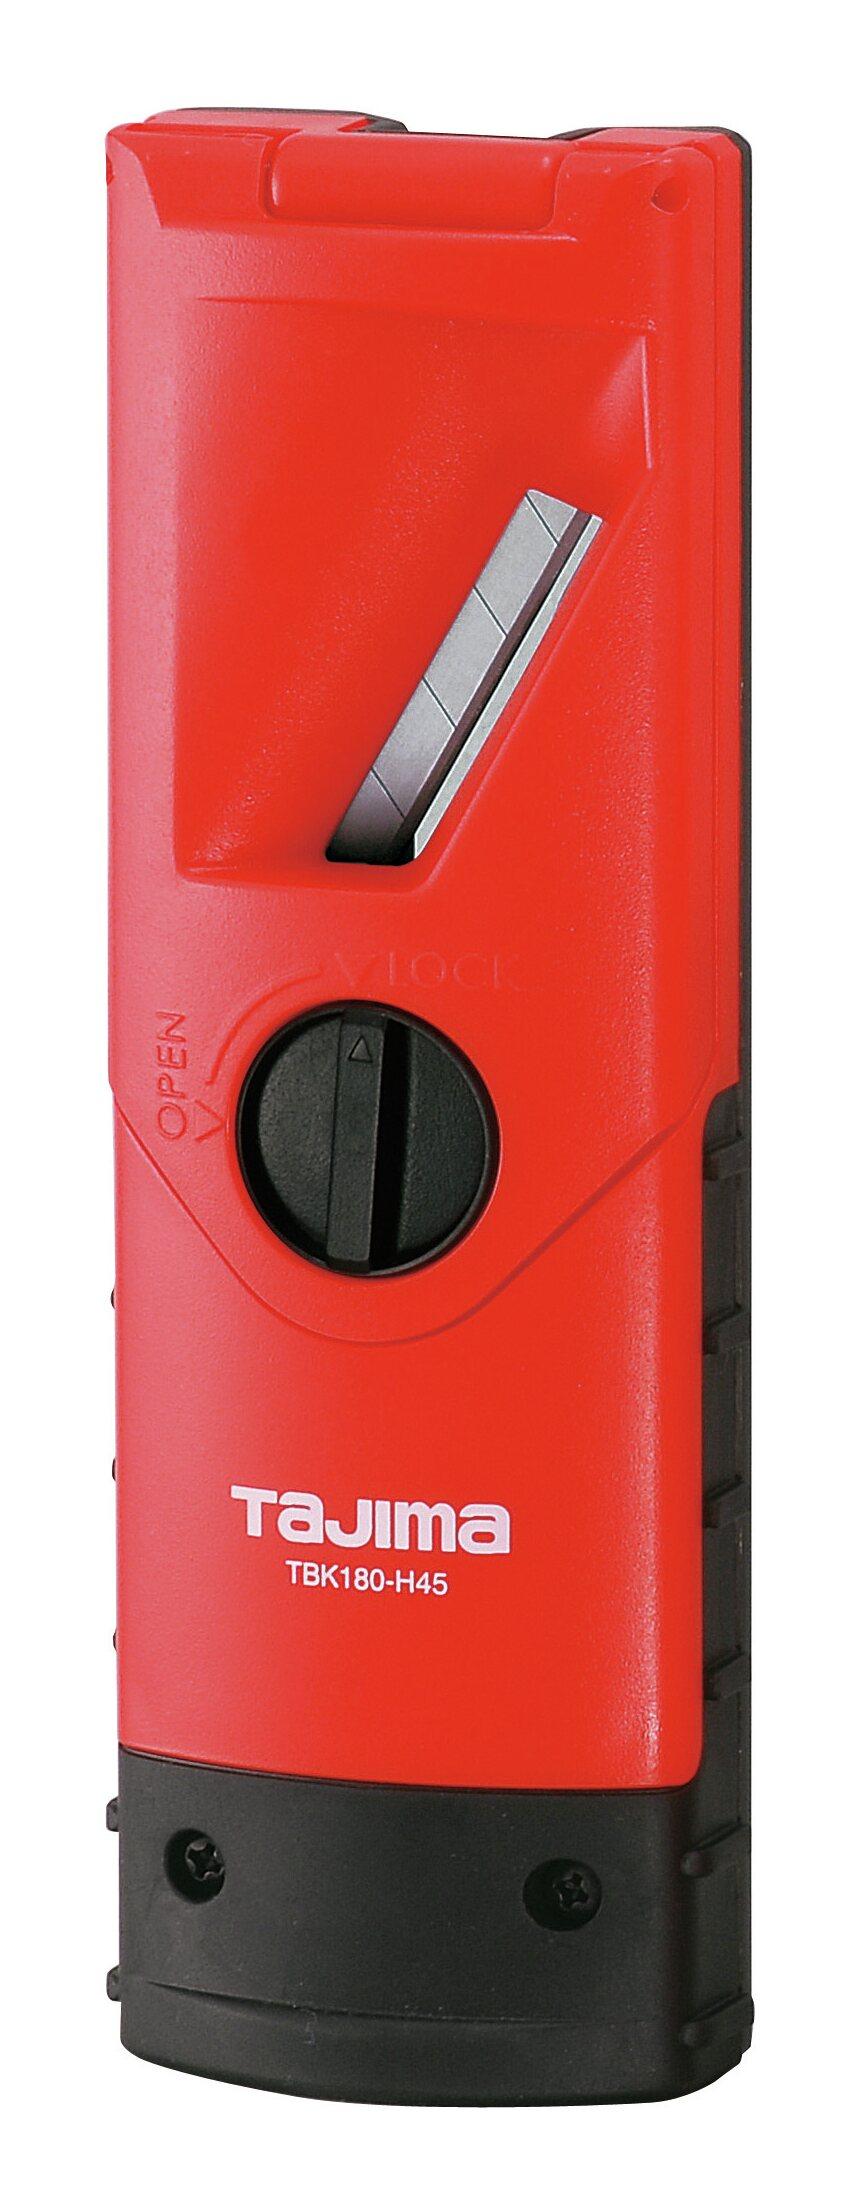 Tajima Kantenhobel- und Raspel Set - SET-TBK180-TBY180